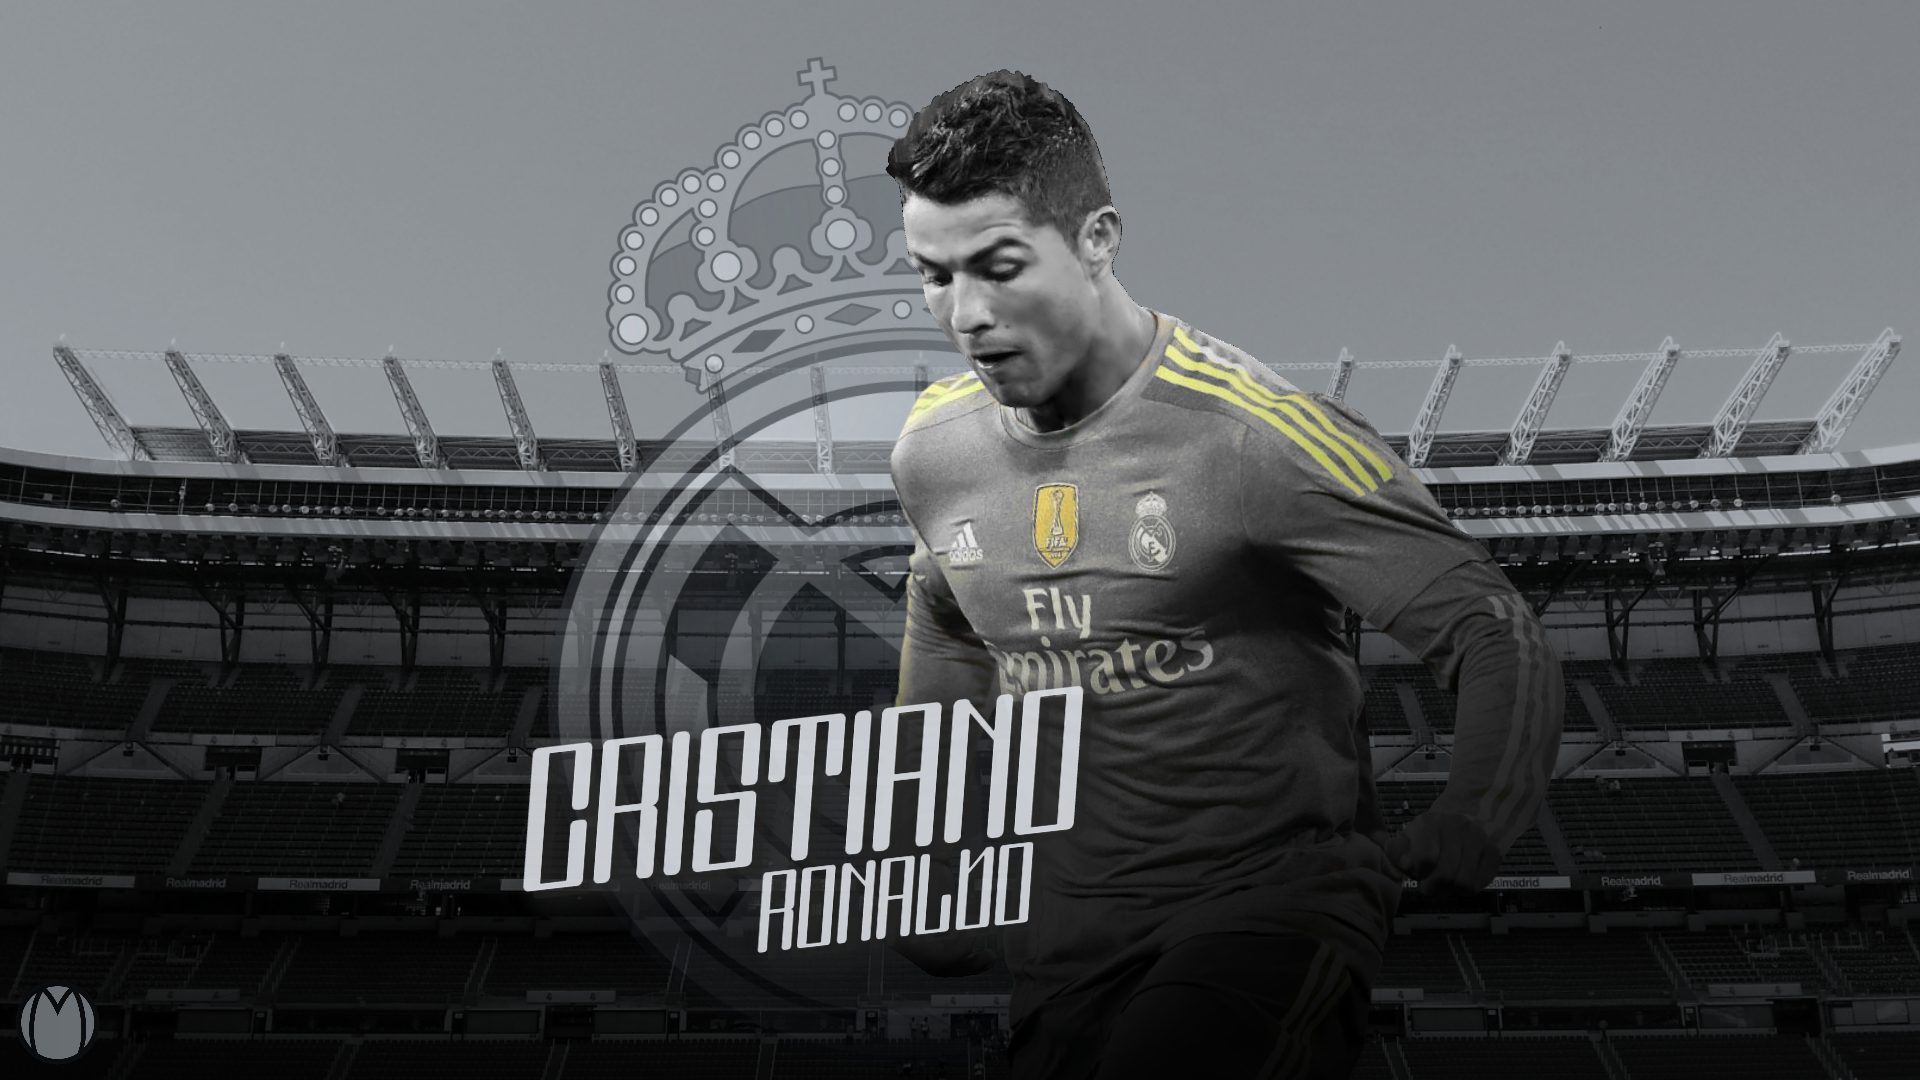 Ronaldo Football Wallpapers HD 1920x1080